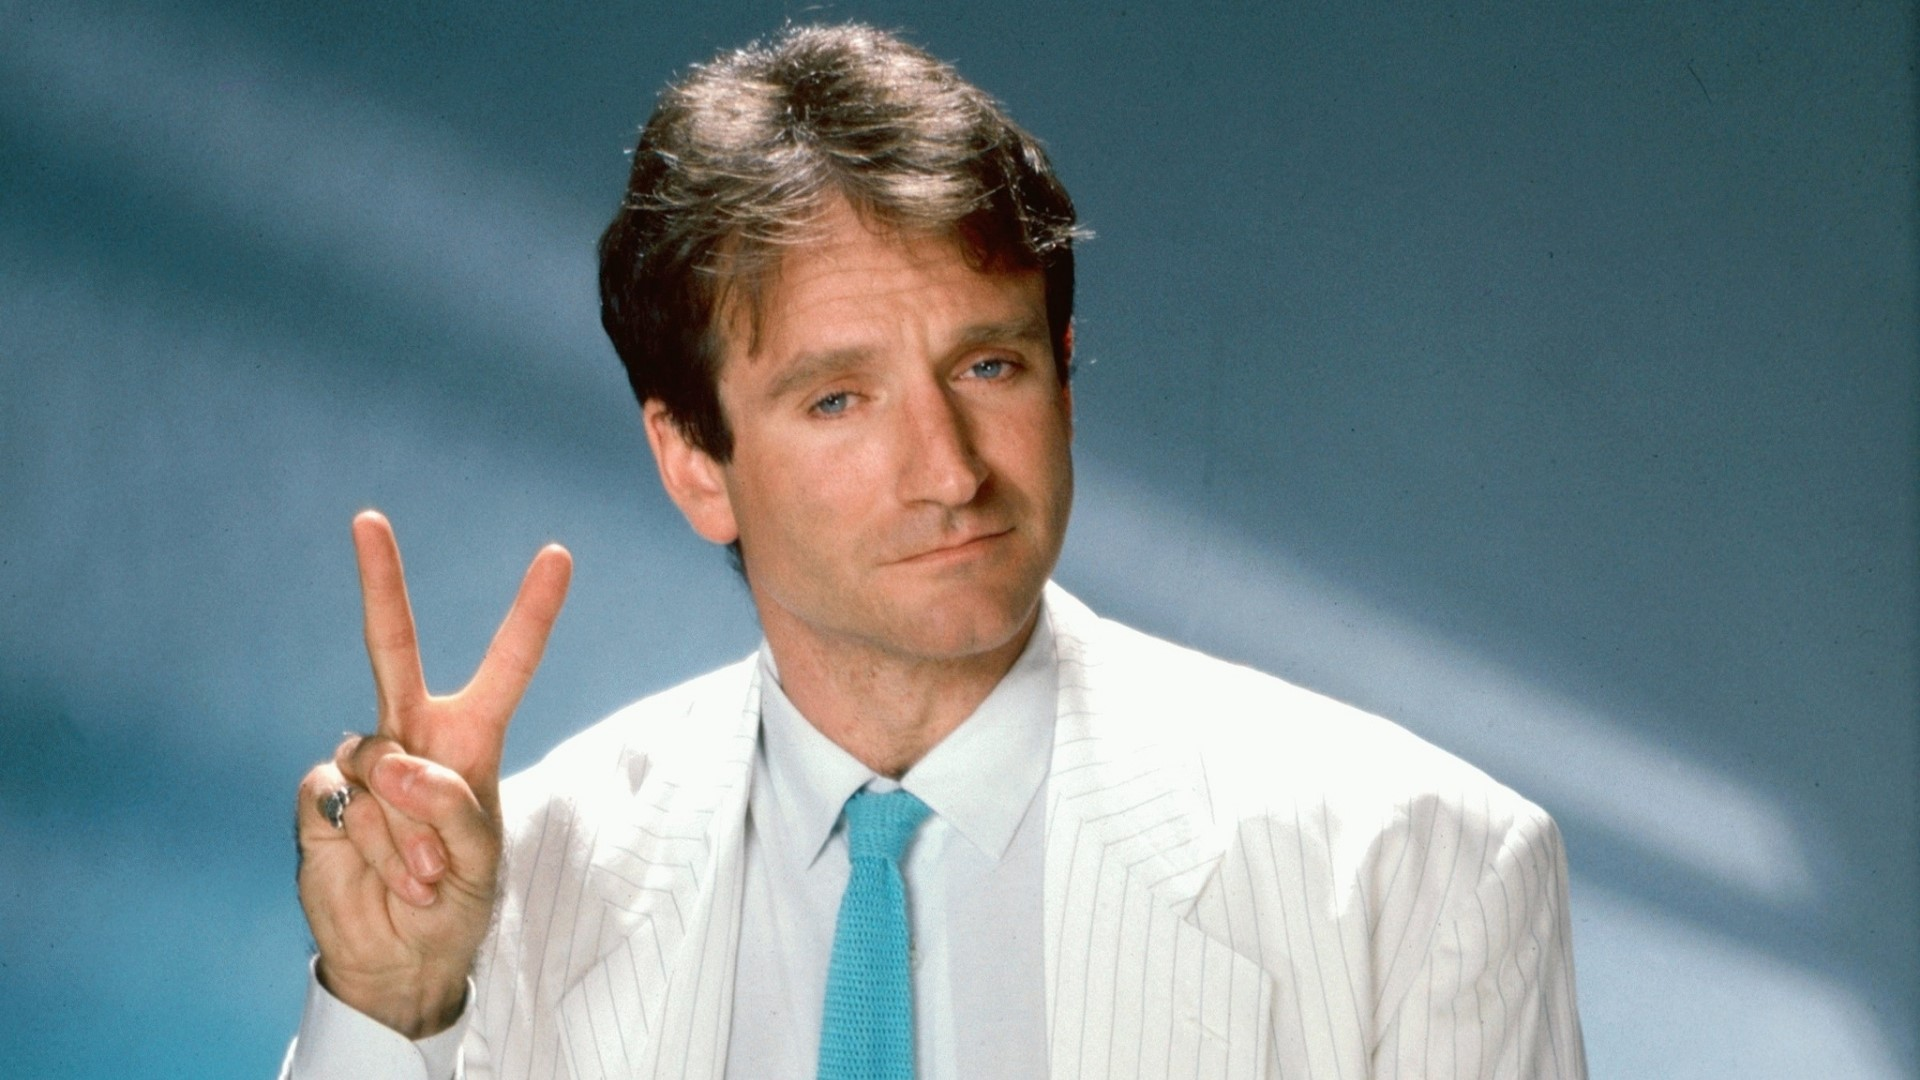 Robin Williams Photos